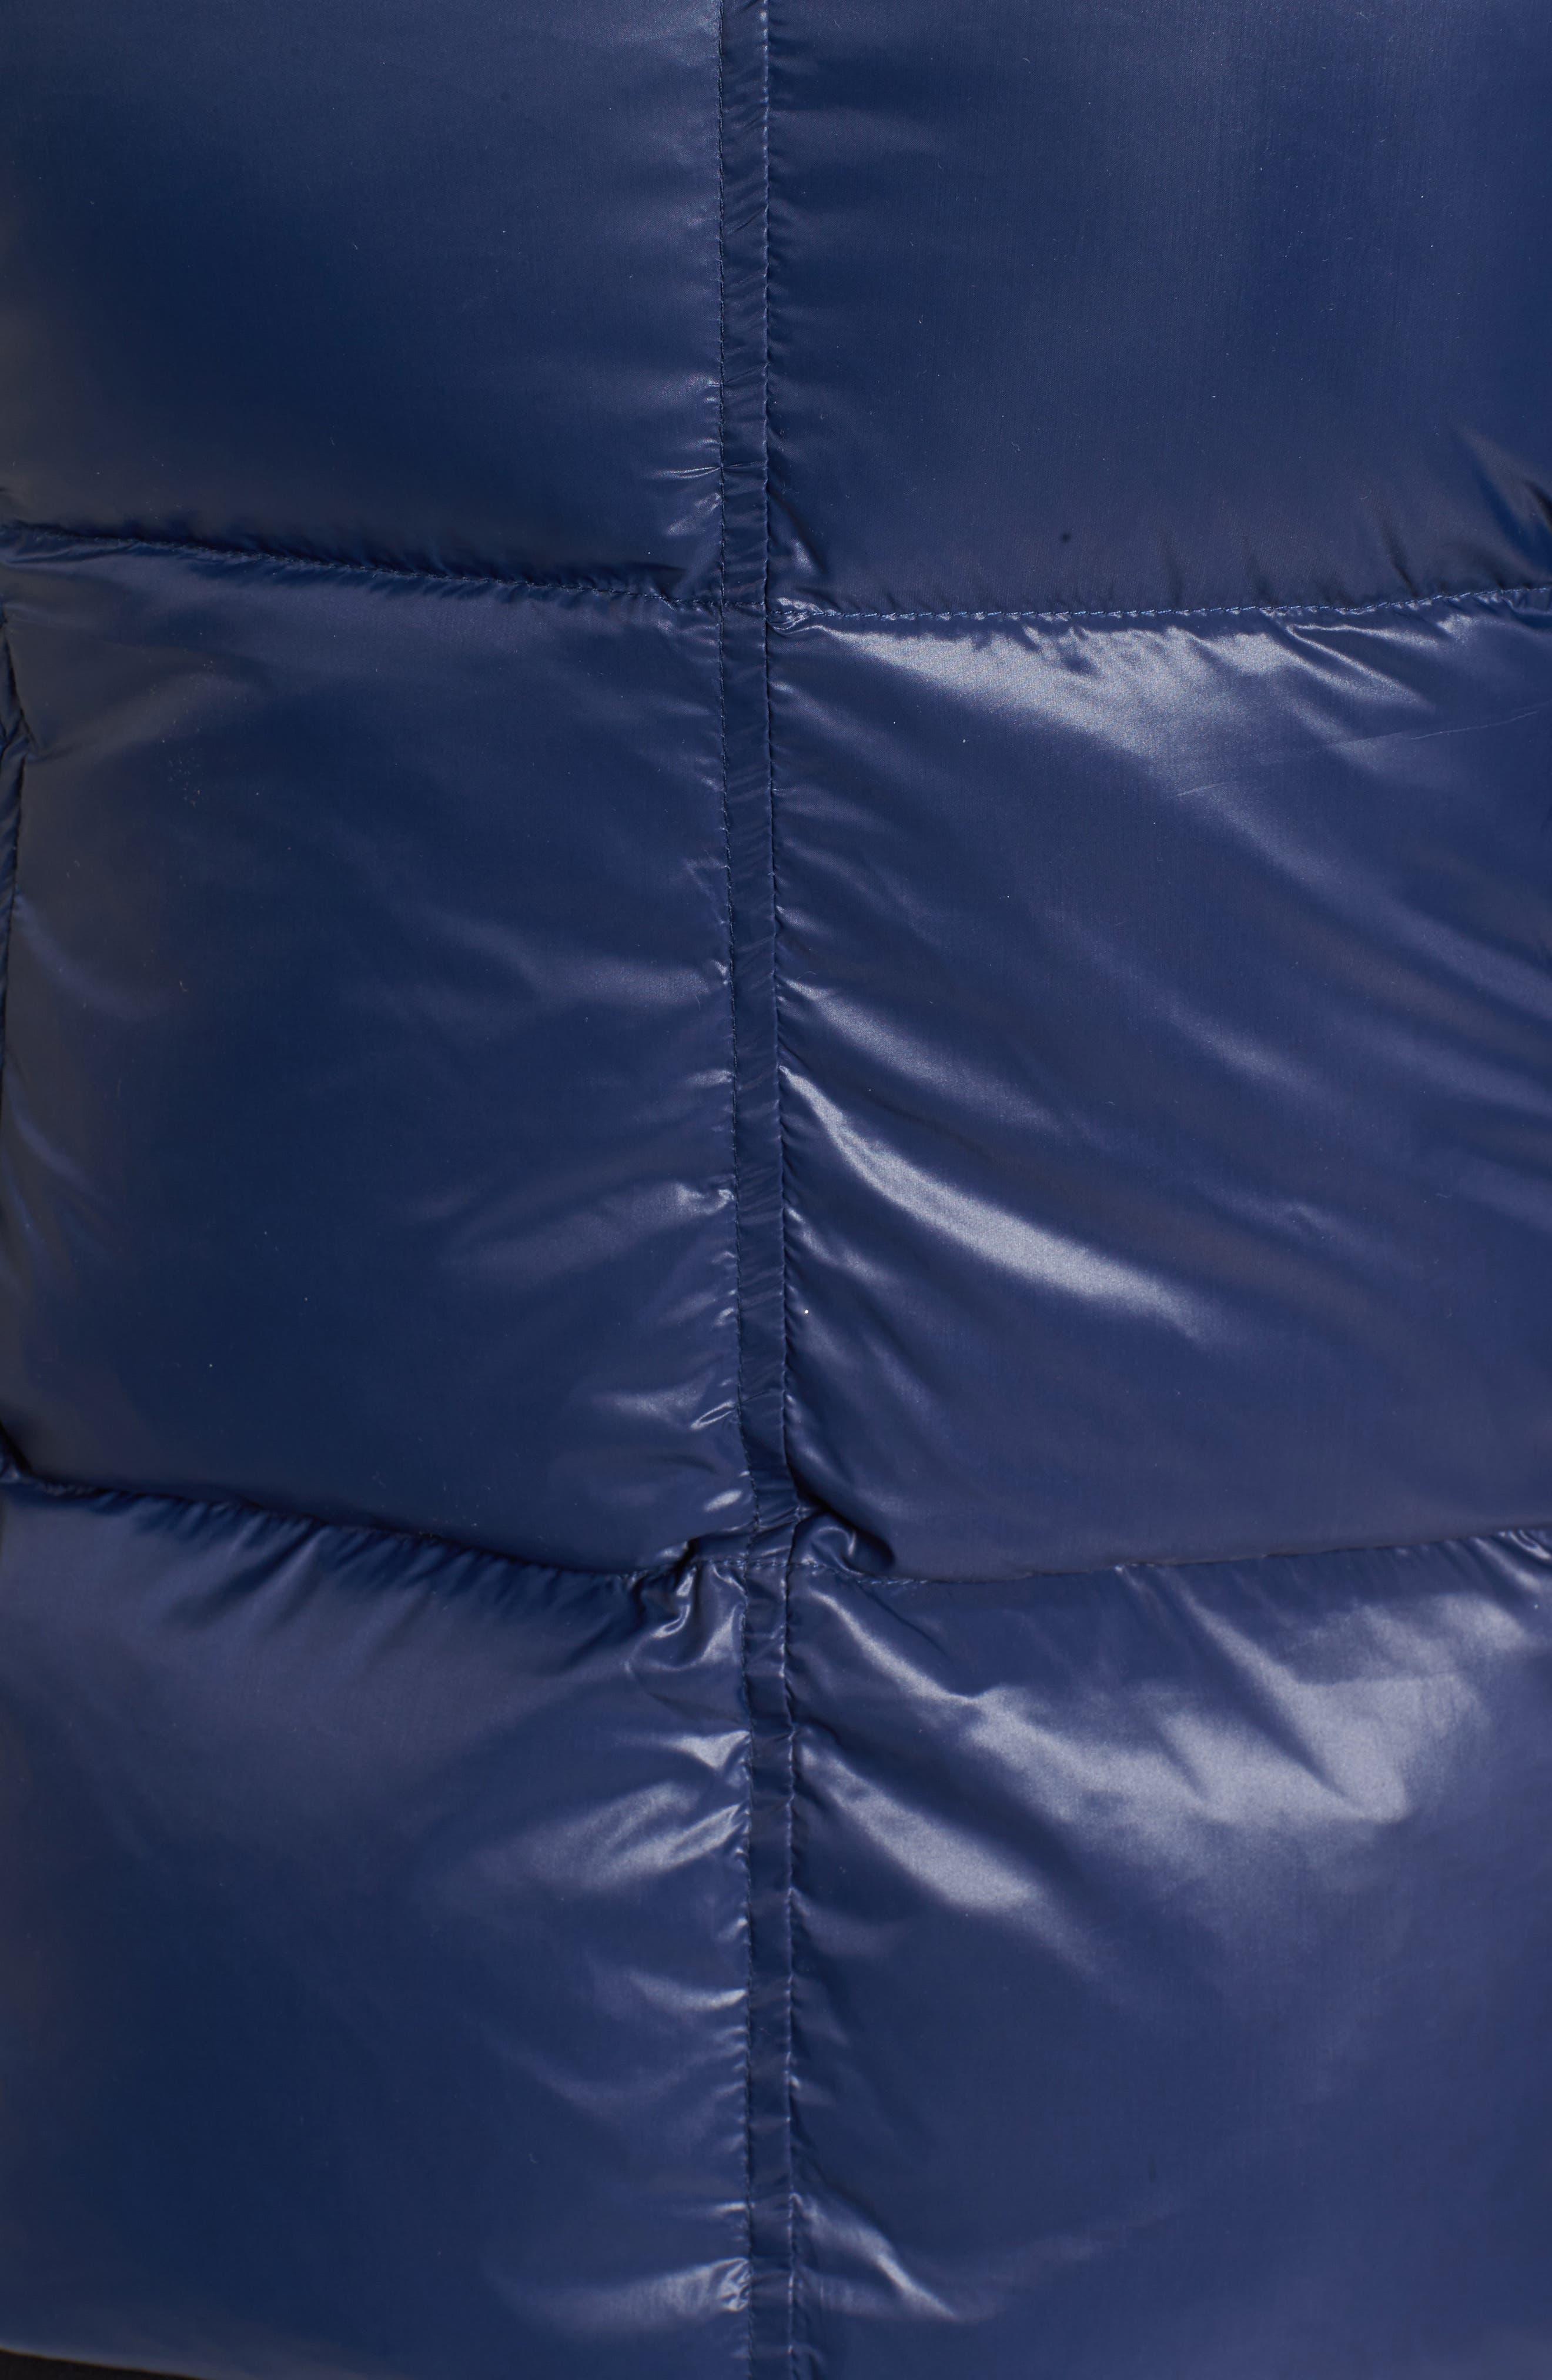 Kylie Faux Fur Trim Gloss Puffer Jacket,                             Alternate thumbnail 5, color,                             Night Blue/ Navy